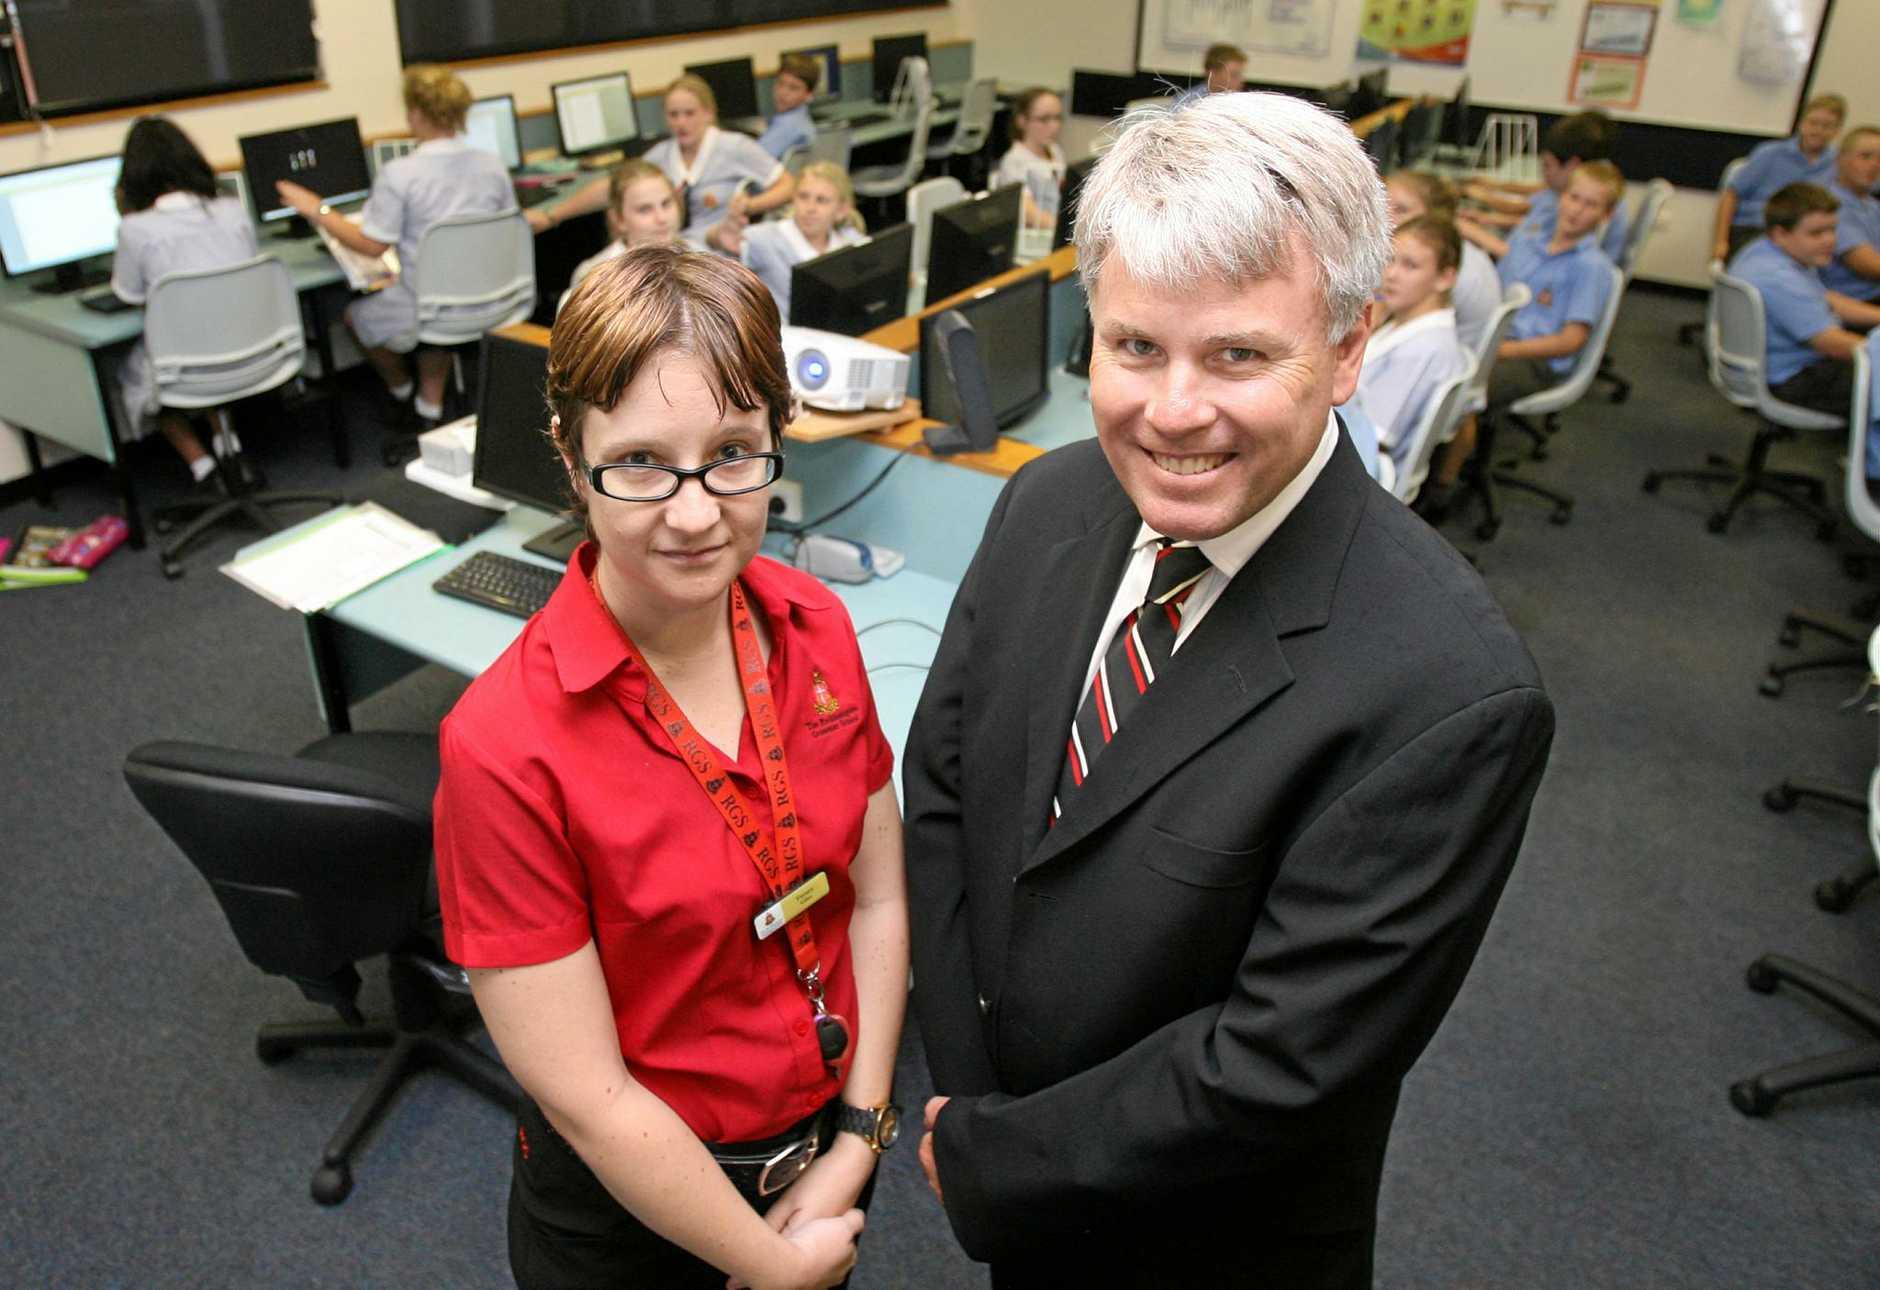 Rockhampton Grammar School teacher Tamara Giles with principal Dr Phillip Moulds.    Photo: Chris Ison / The Morning Bulletin